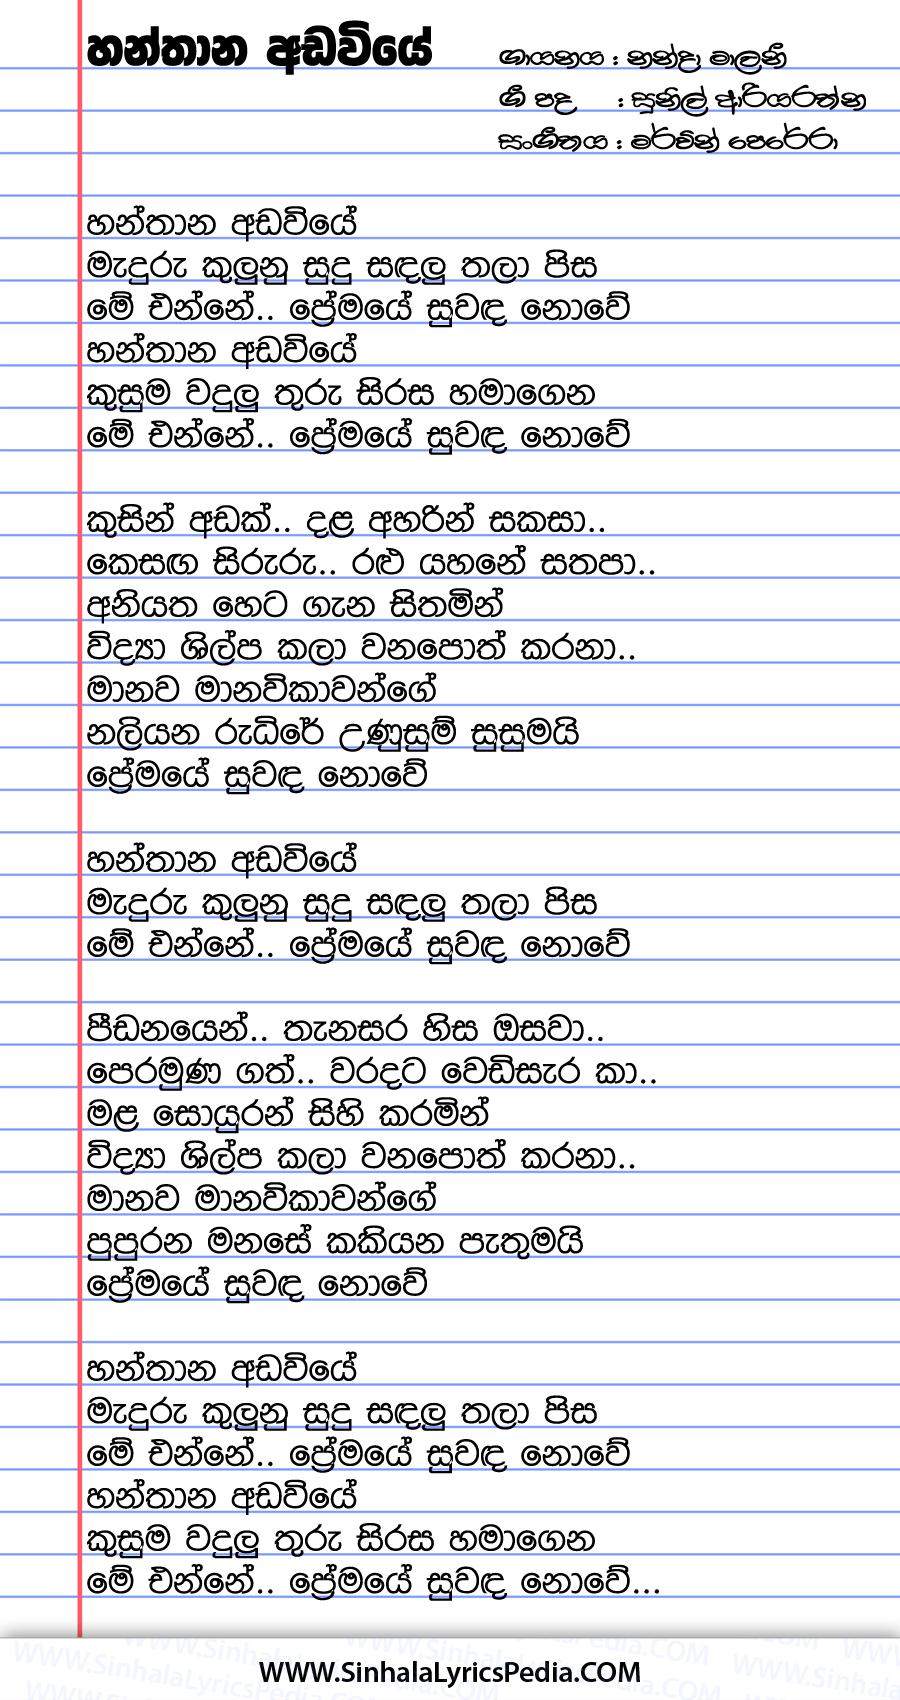 Hanthana Adaviye Maduru Kulunu Sudu Sadalu Thala Pisa Song Lyrics